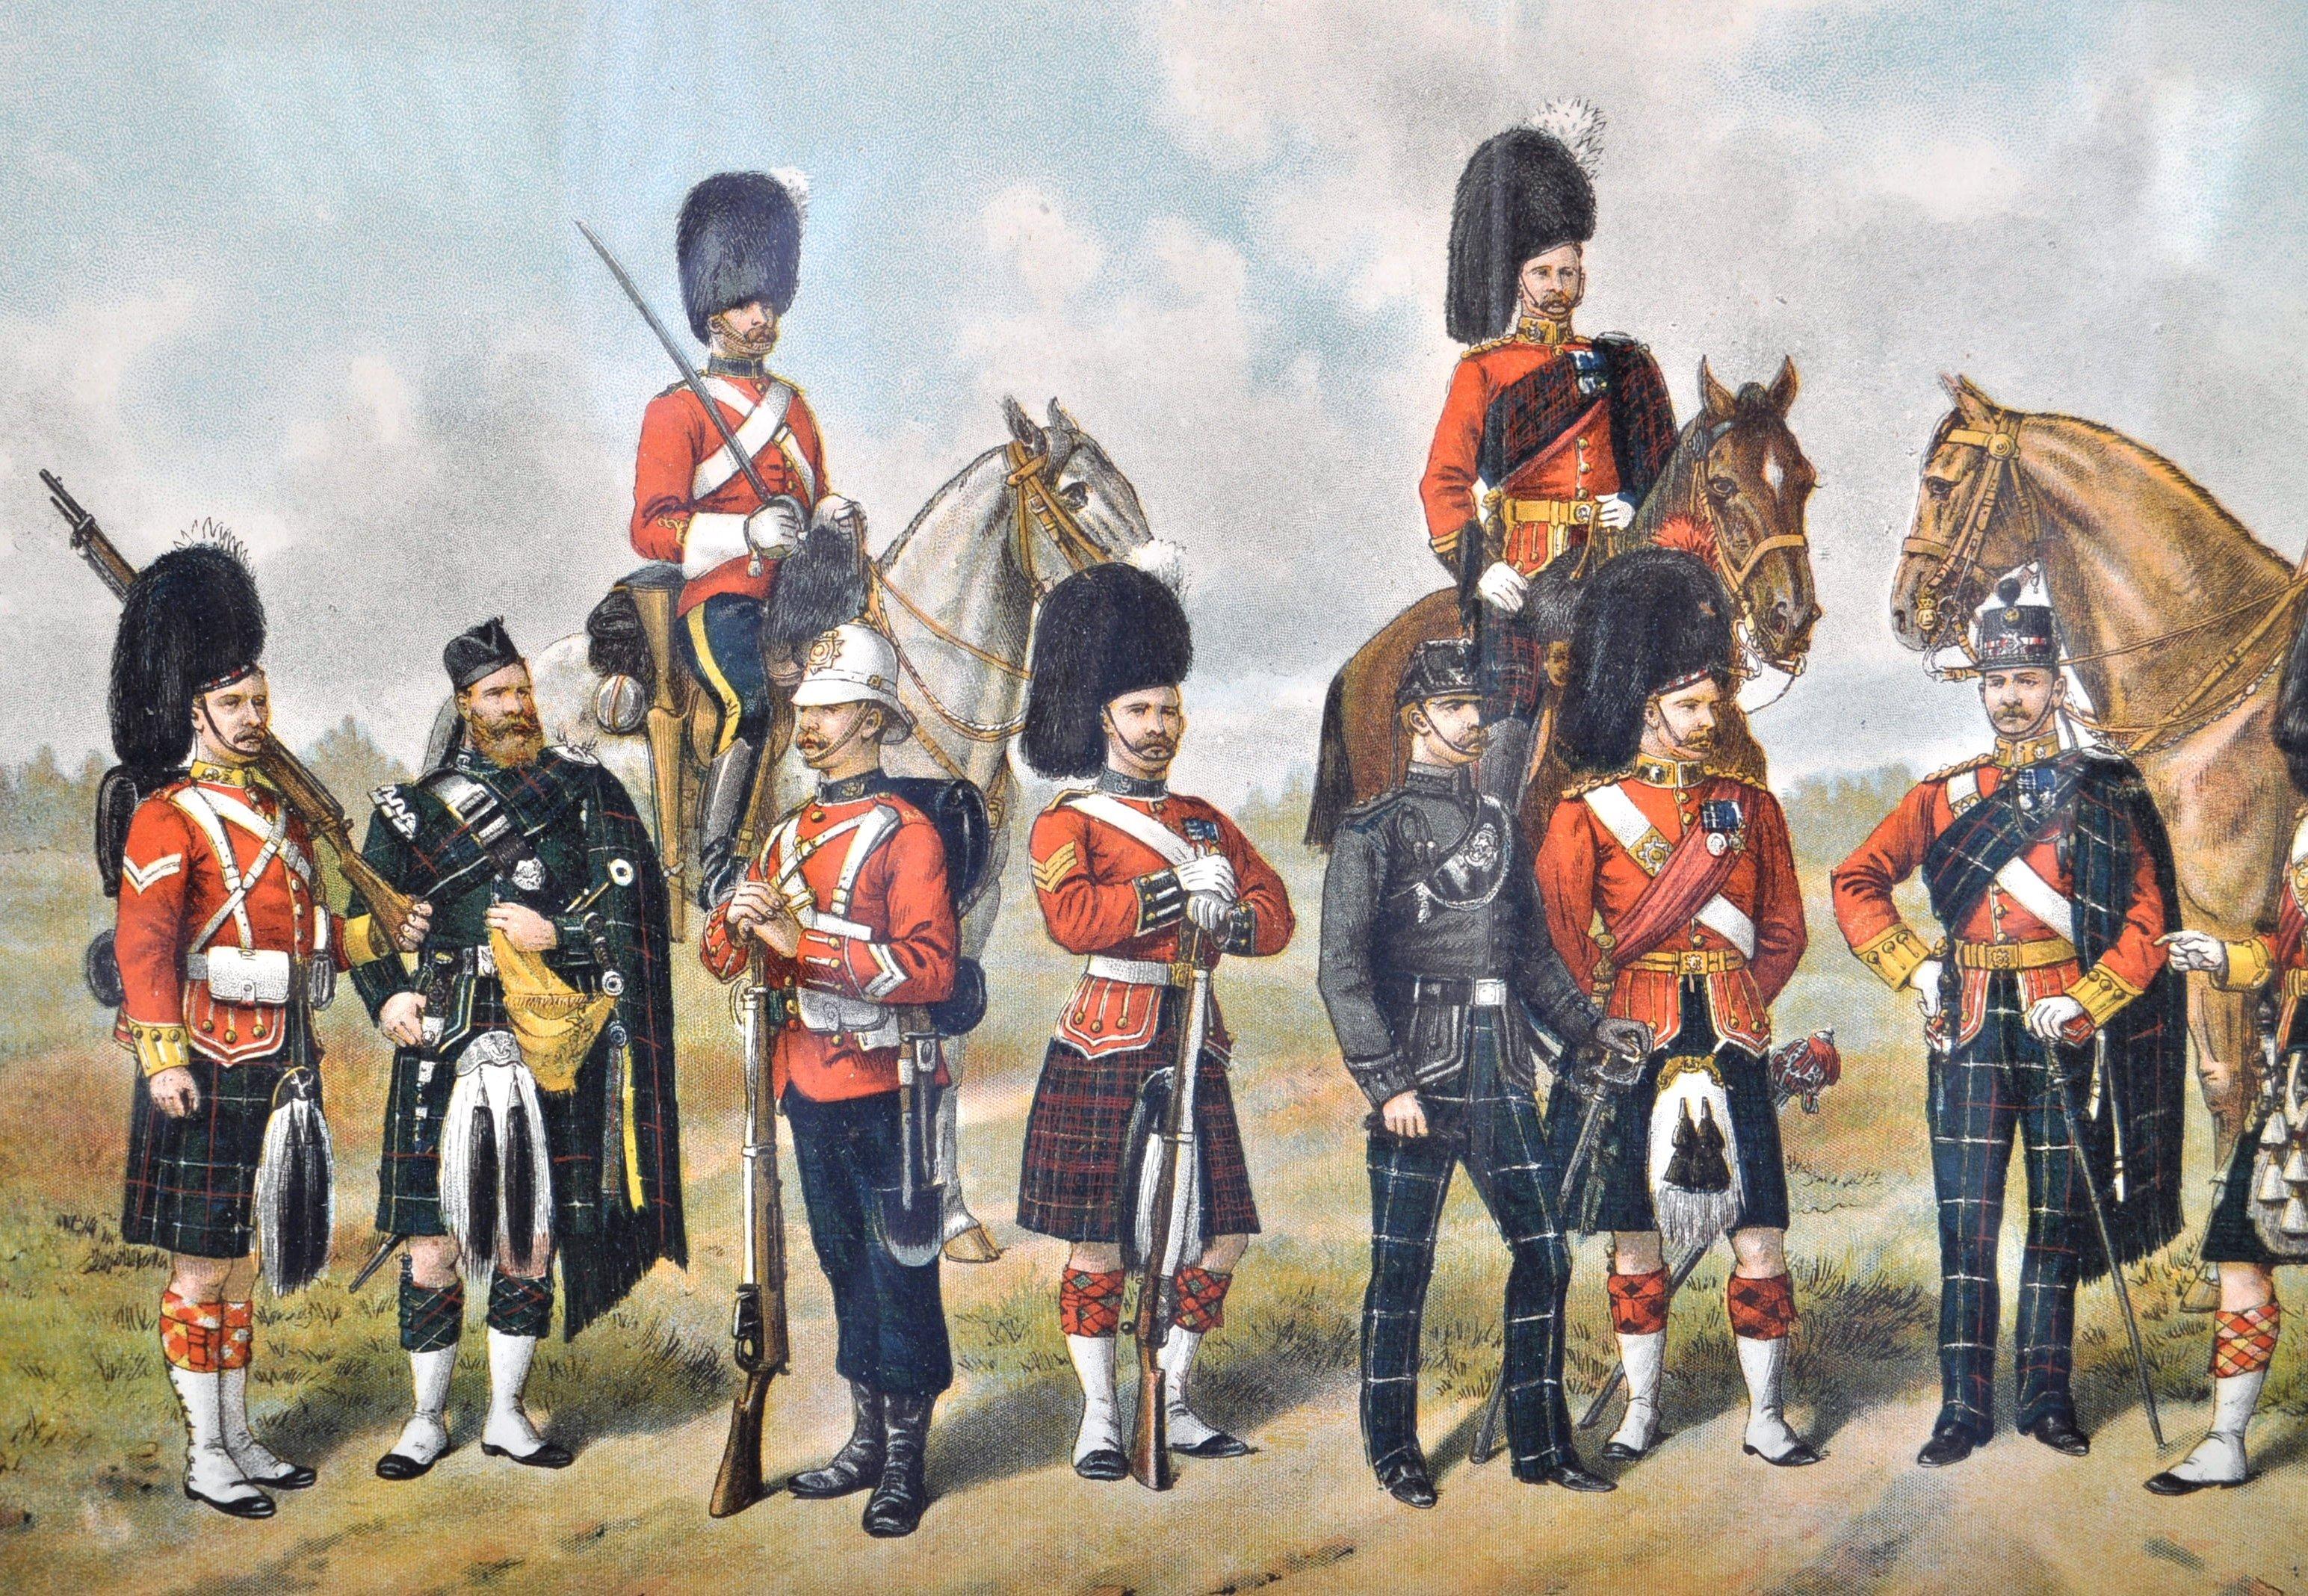 RICHARD SIMKIN - THE SCOTTISH REGIMENTS OF THE BRITISH ARMY - Image 2 of 7